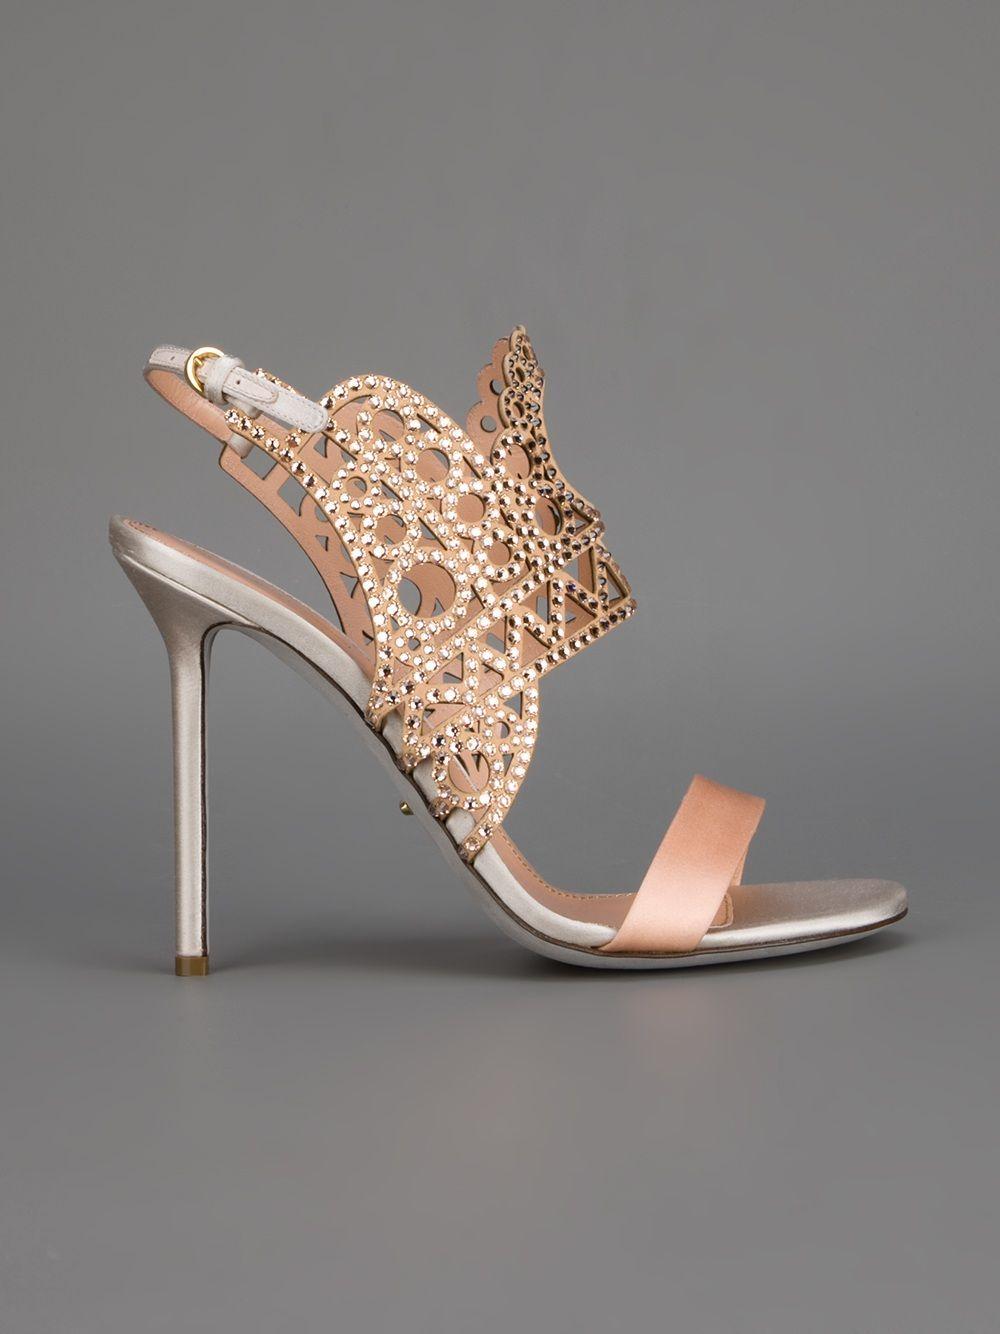 456e55b57468 Sergio Rossi Laser Cut Strap High Heel Sandal - - Farfetch.com ...